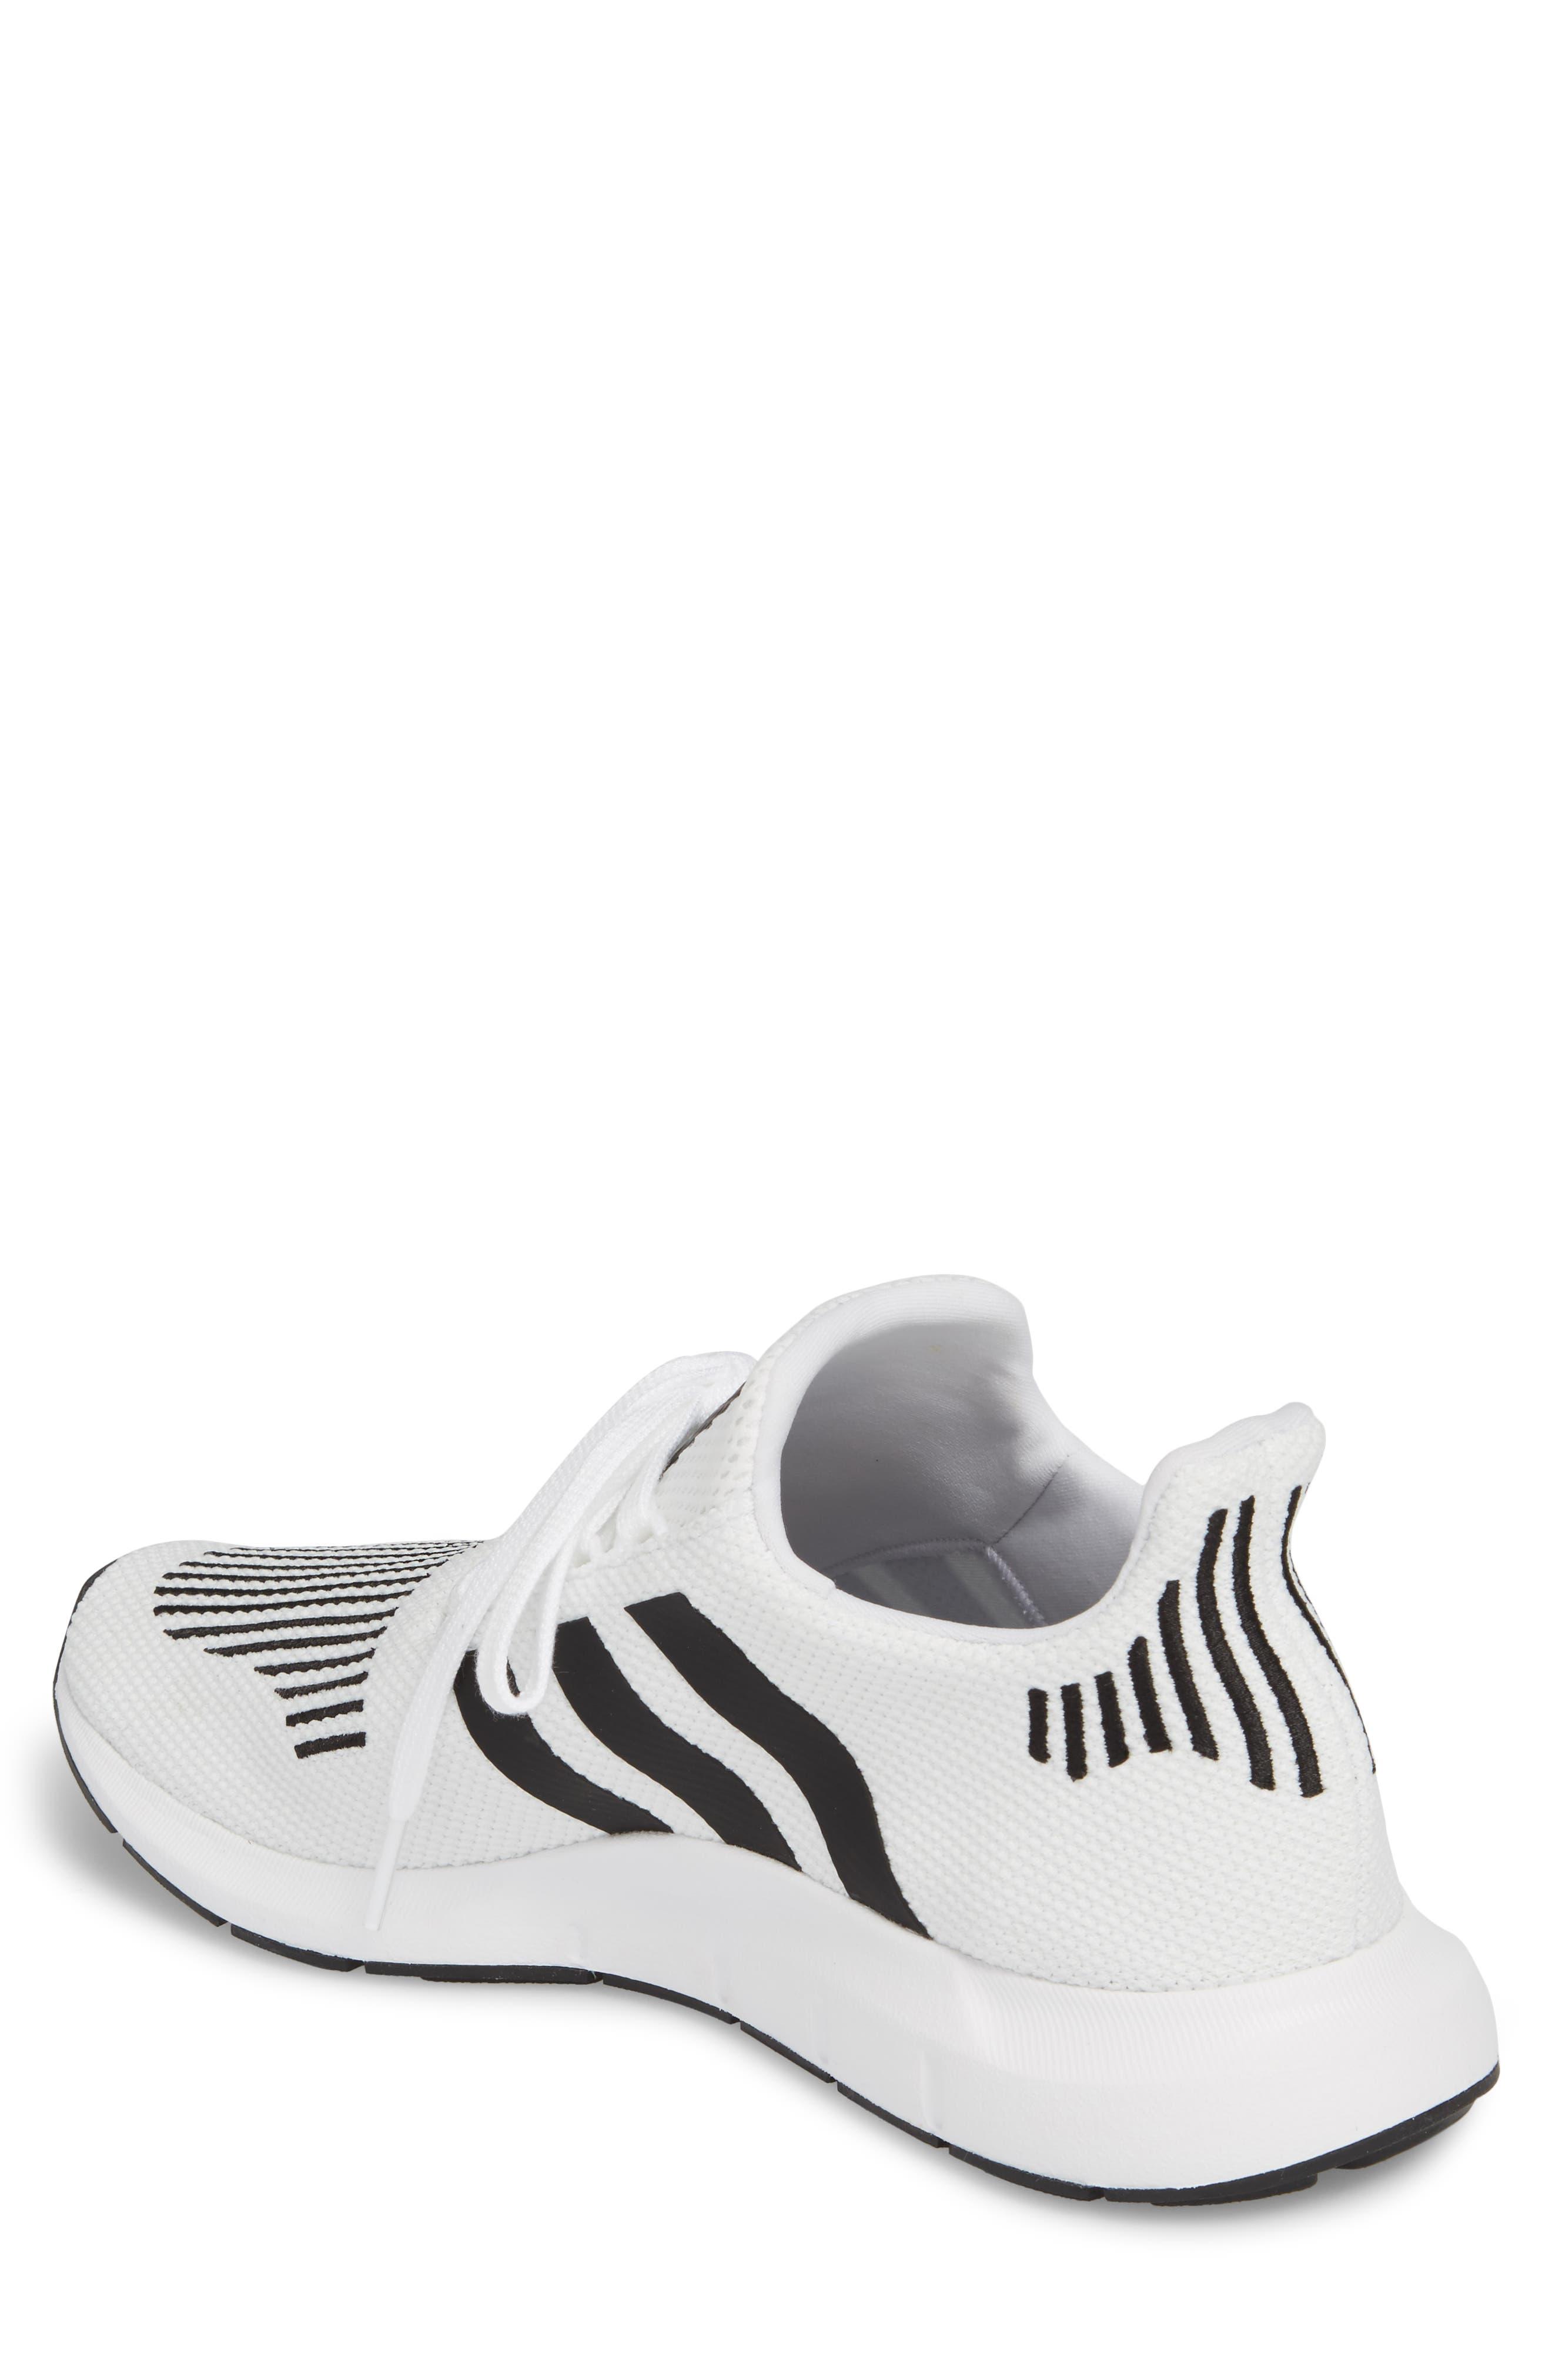 adidas nmd r1 grey four nordstrom adidas stan smith kids green